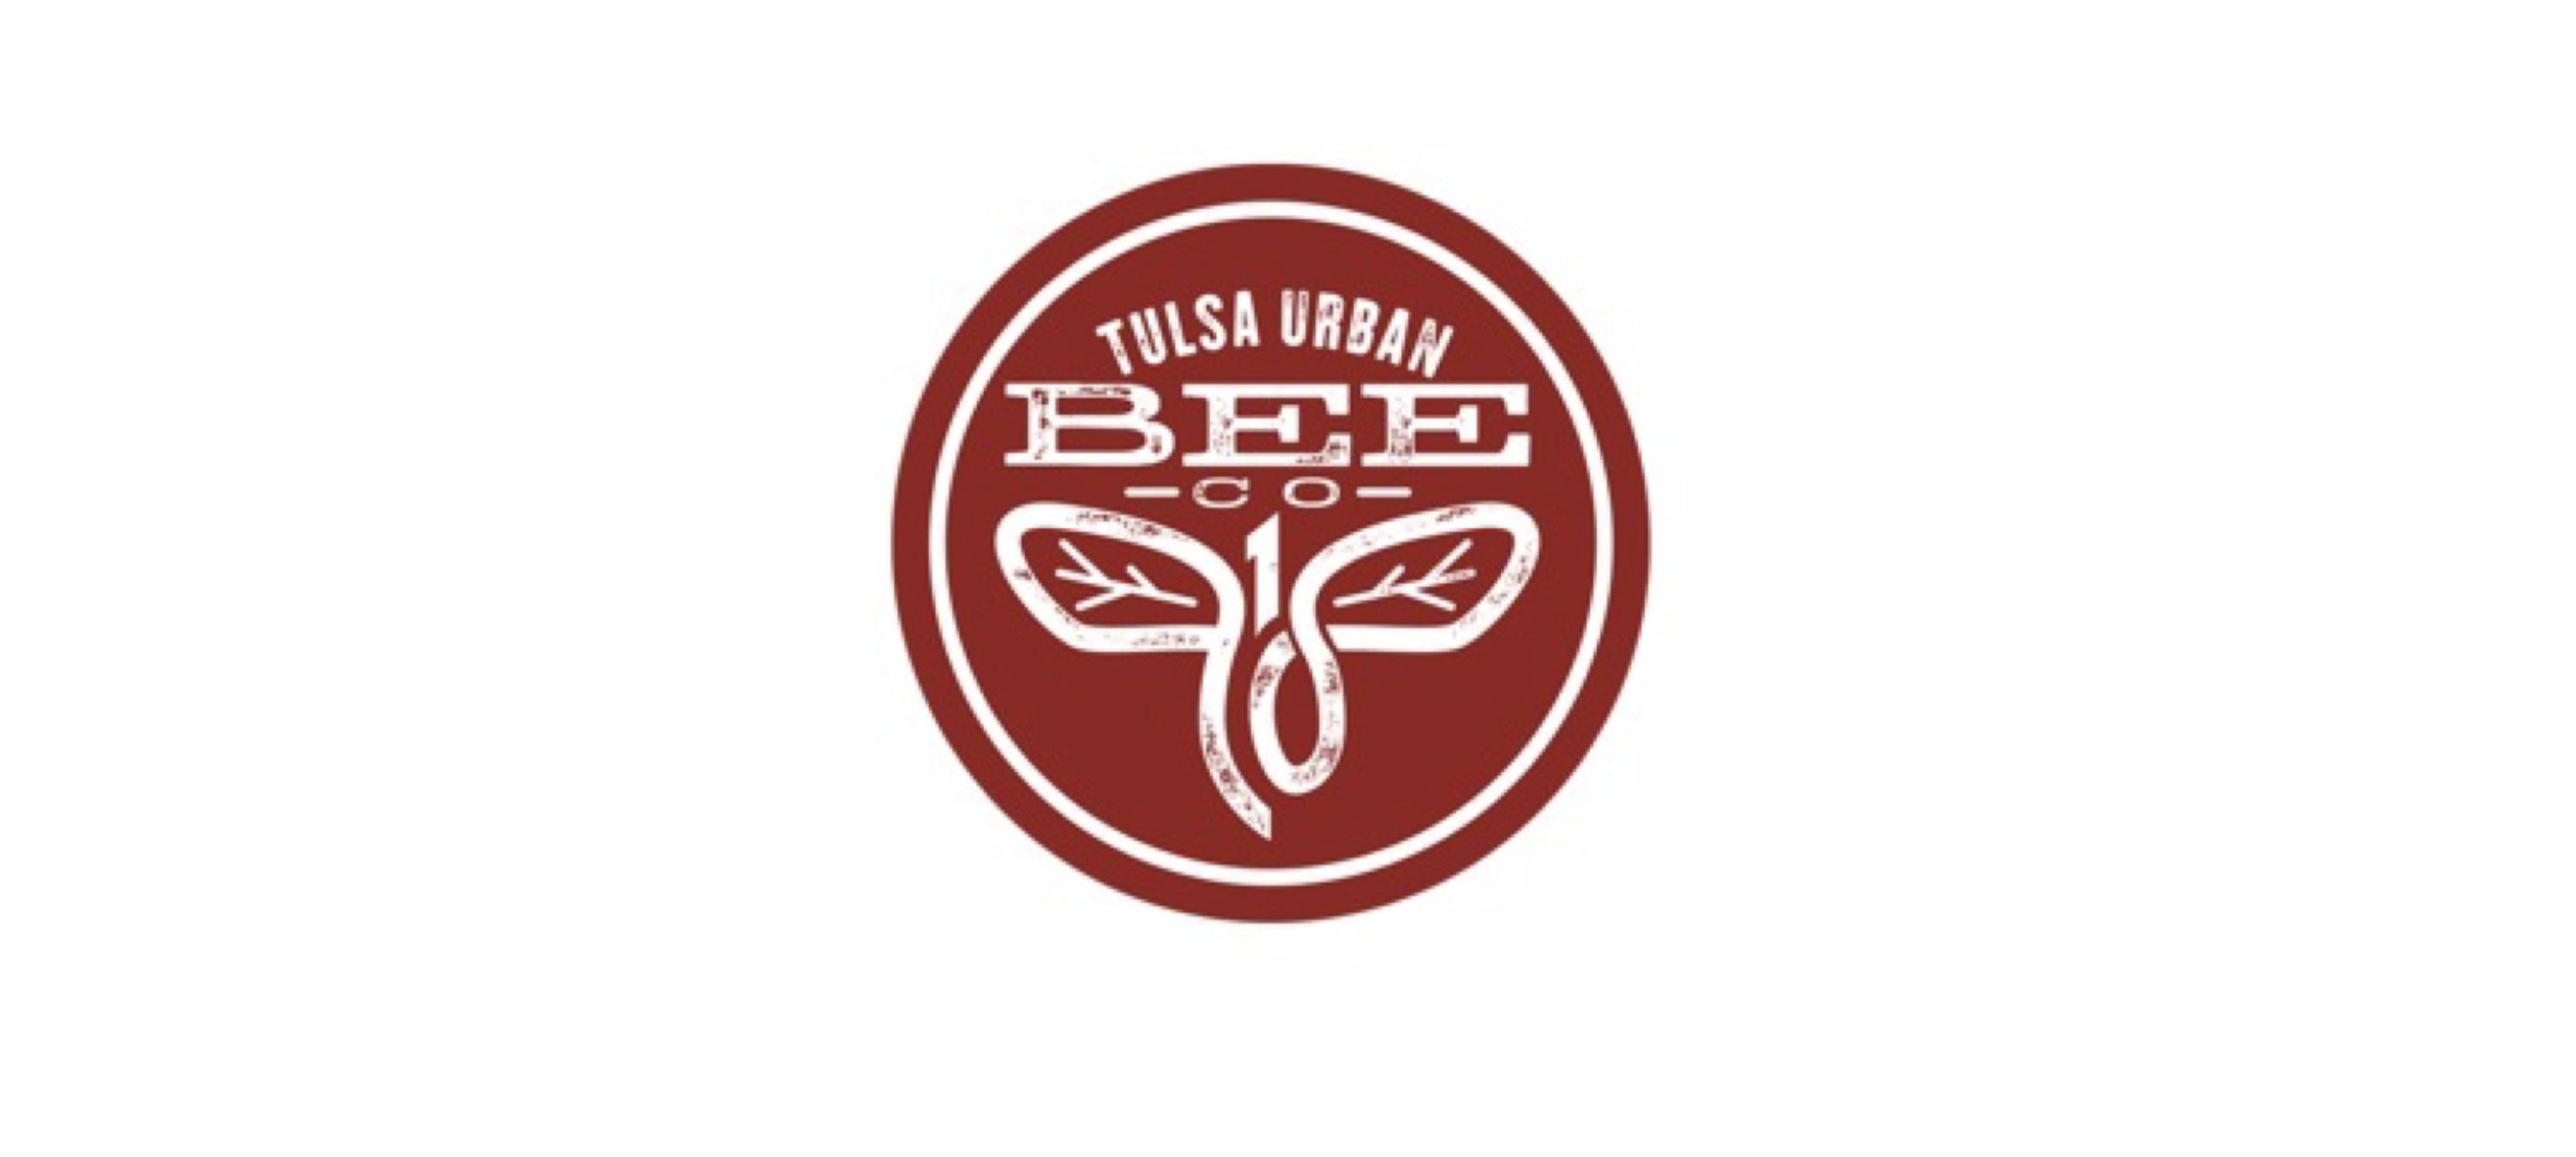 Tulsa Urban Bee Co.